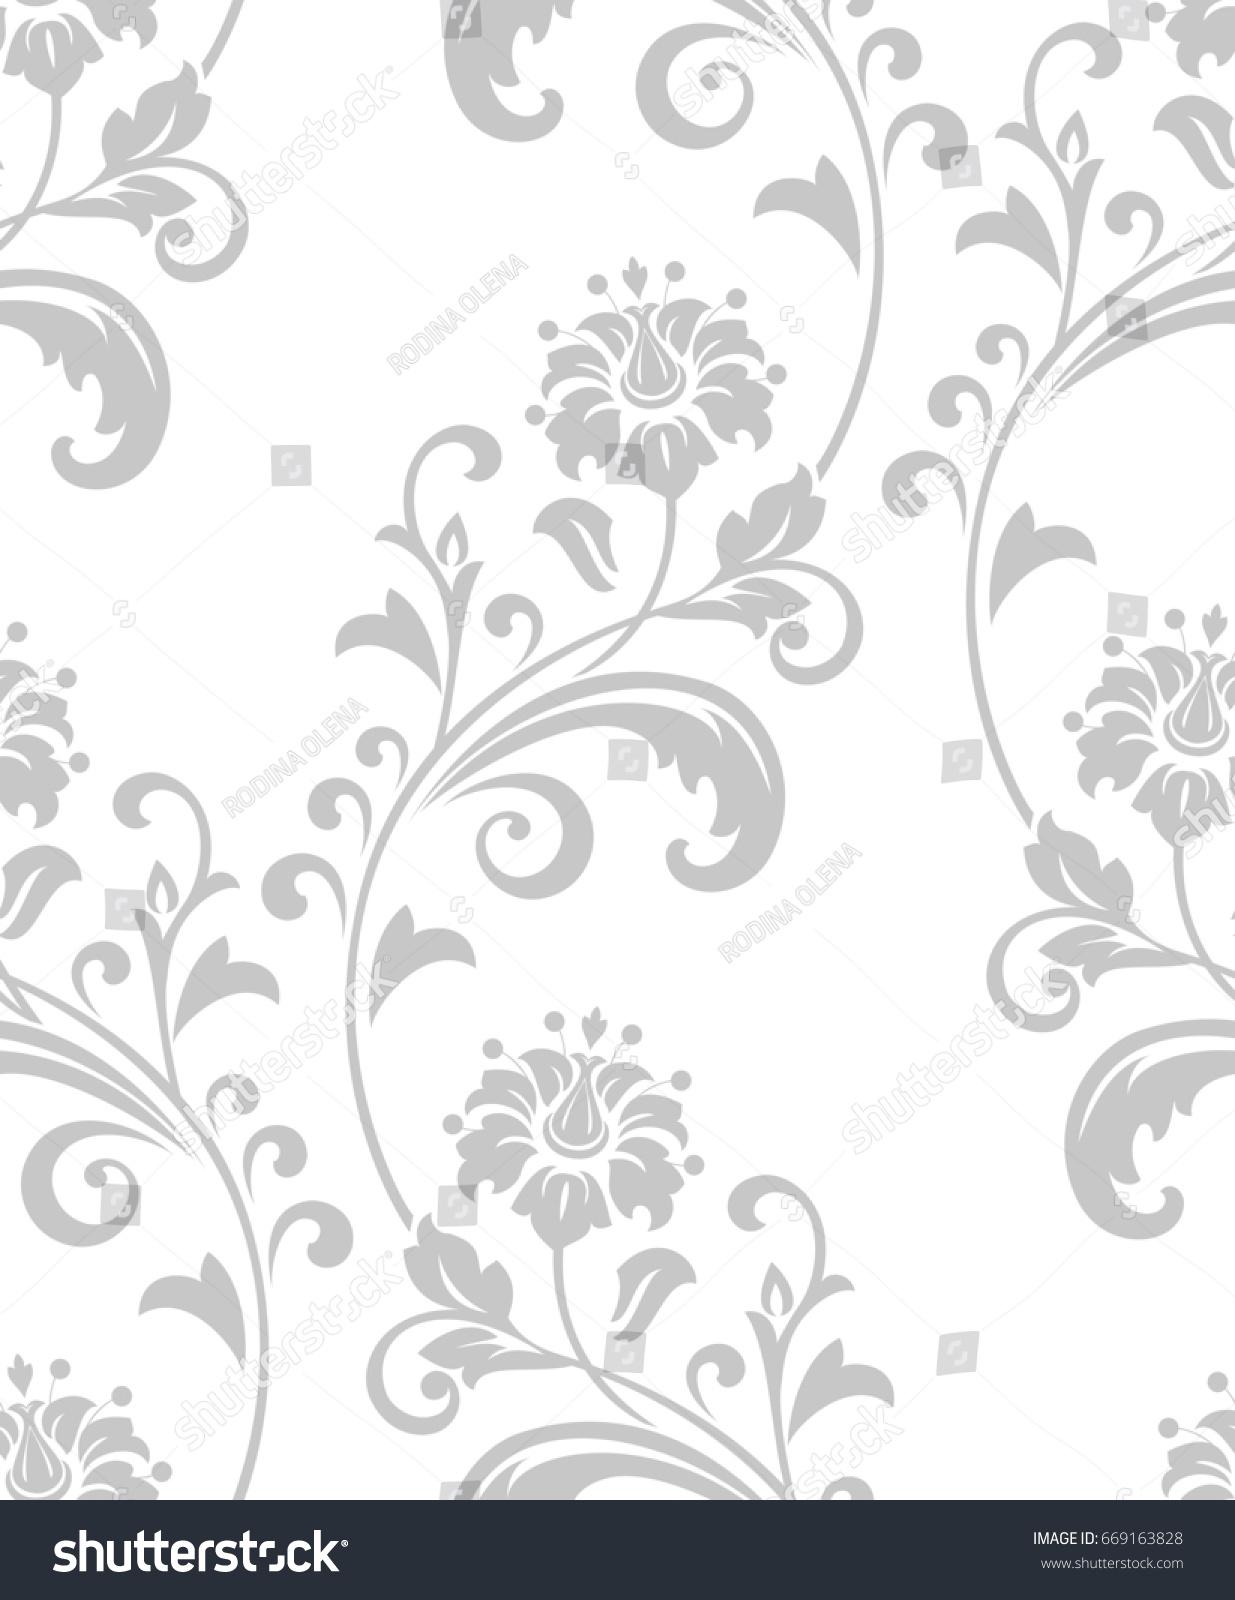 Damask Seamless Floral Pattern Royal Wallpaper Stock Illustration